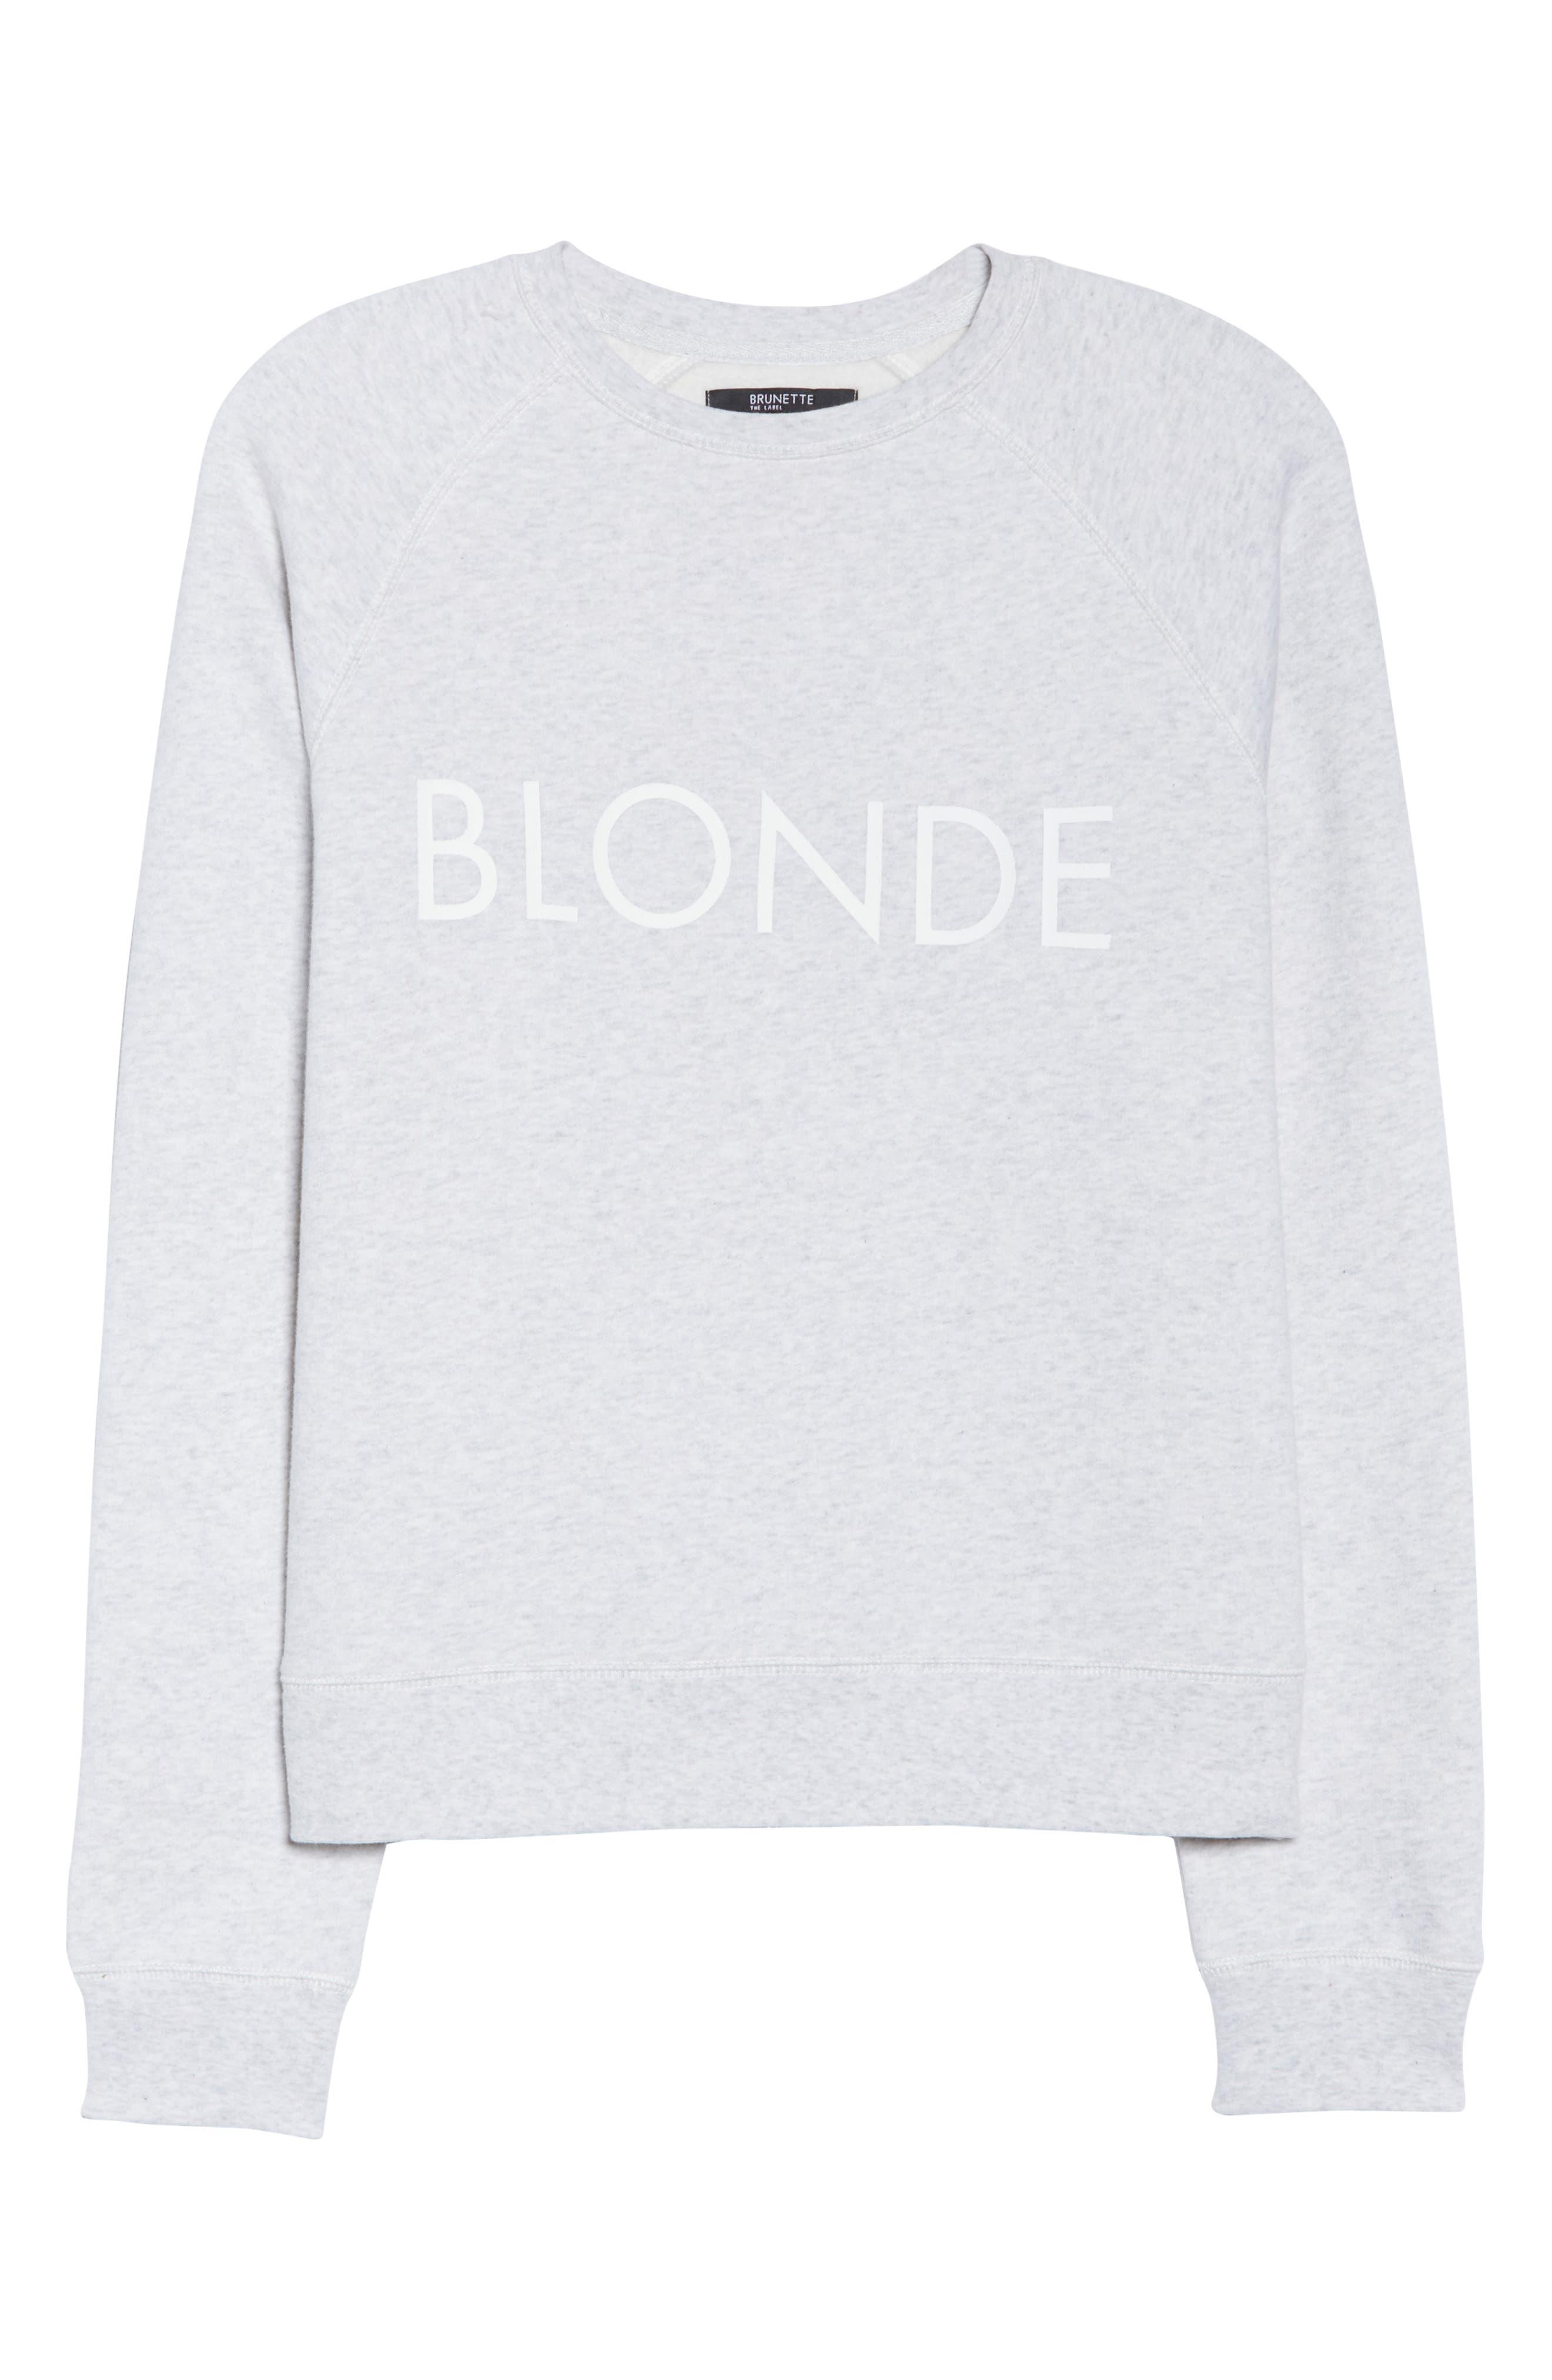 Blonde Sweatshirt,                             Alternate thumbnail 6, color,                             250